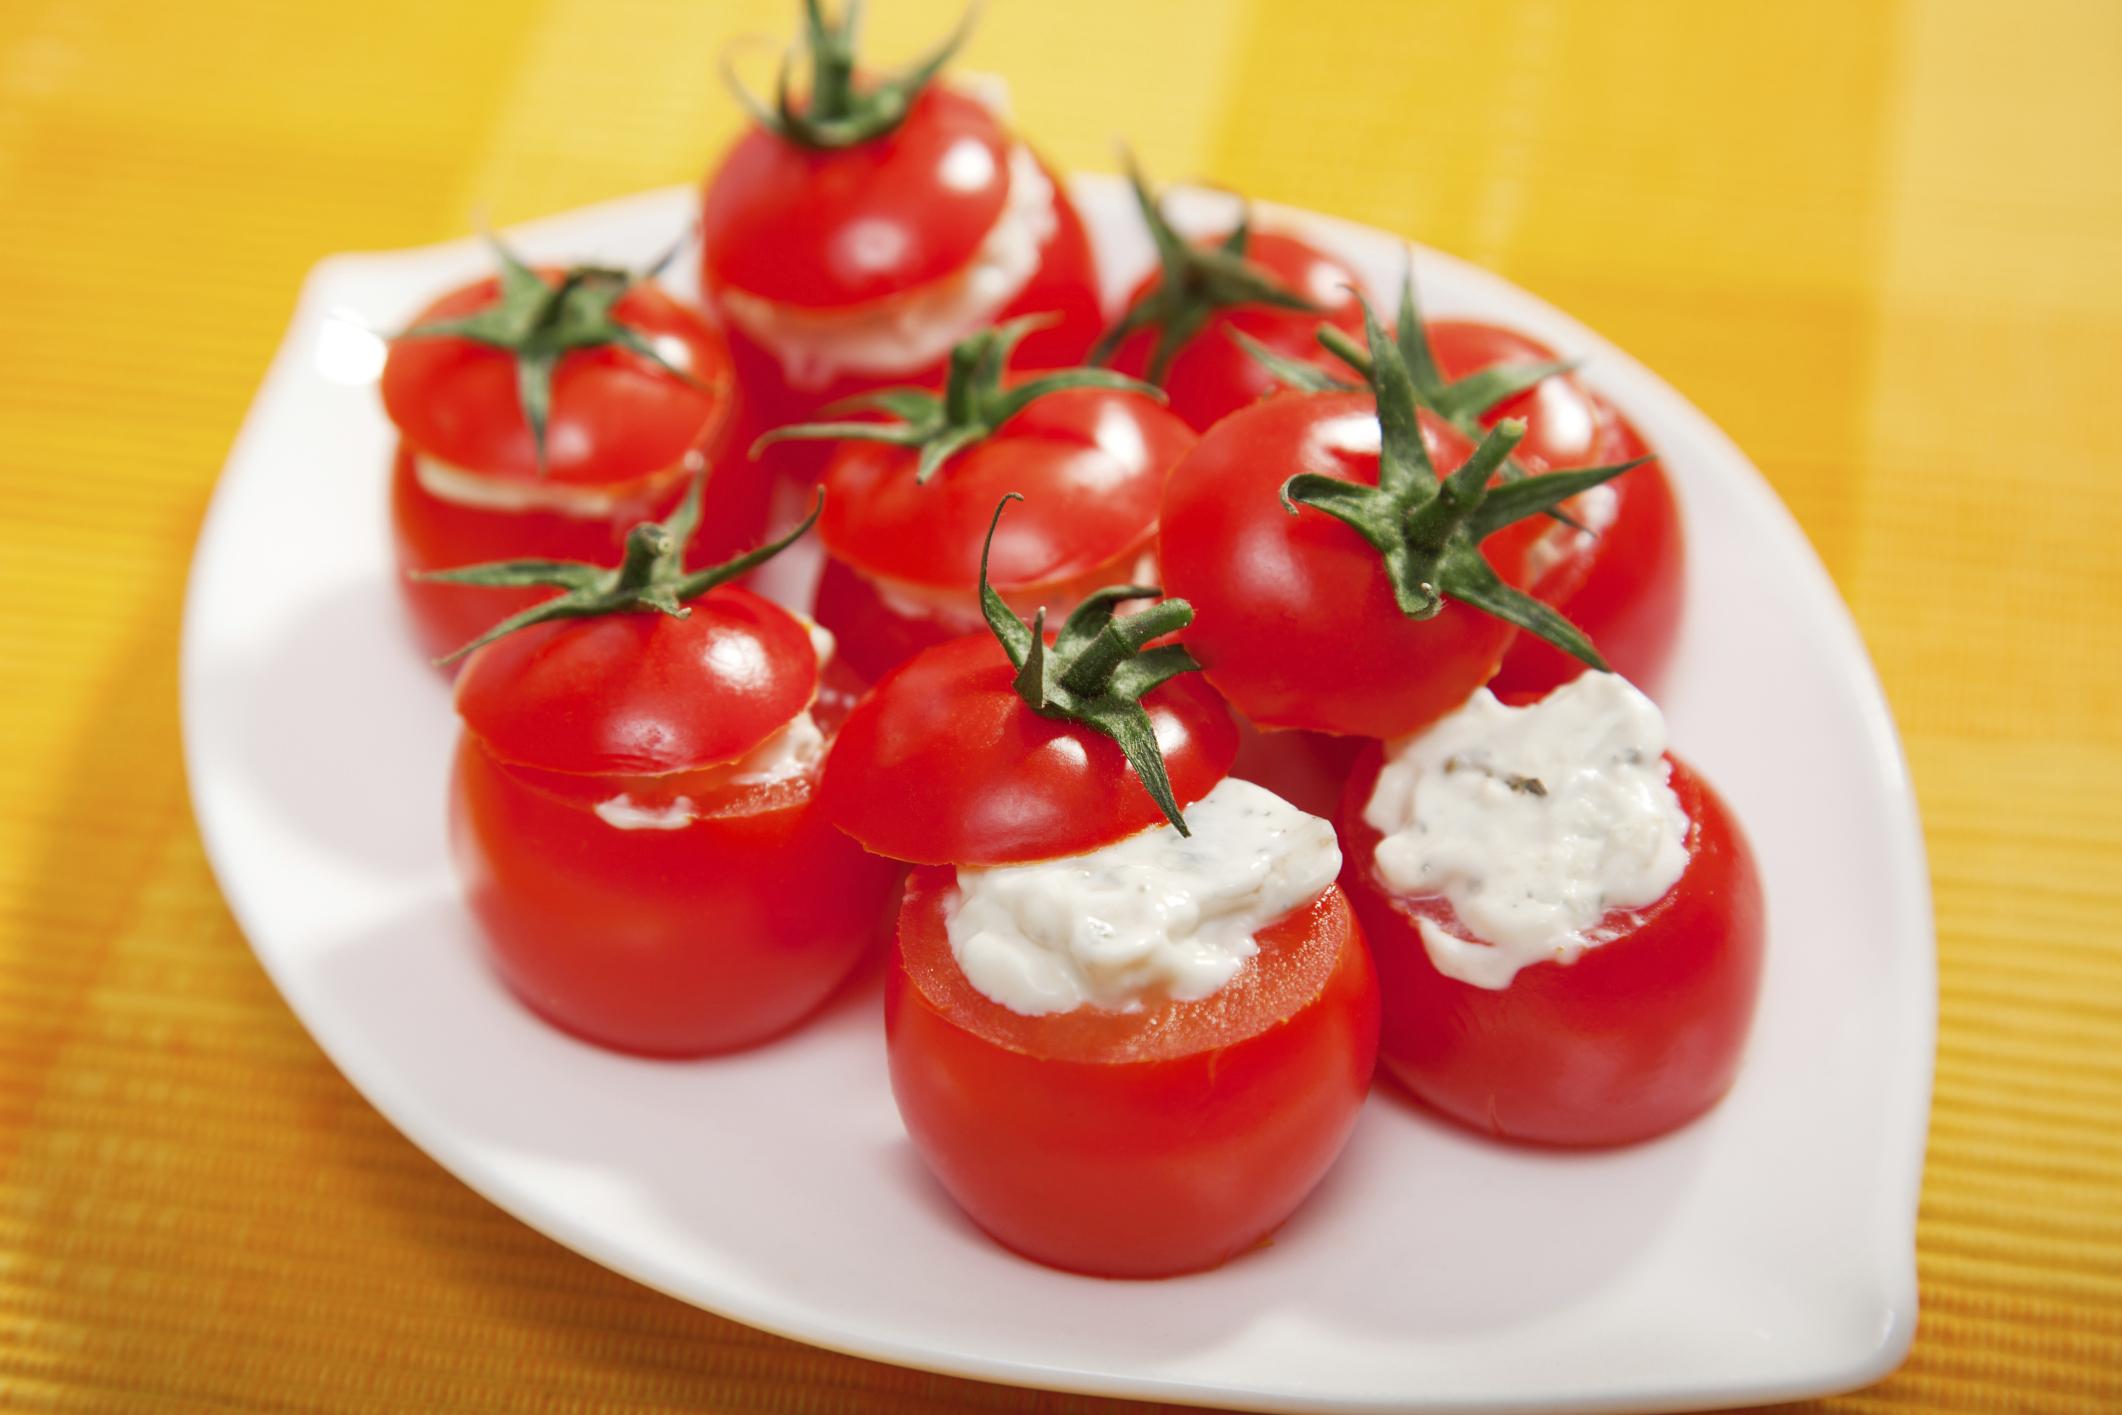 Tomatitos rellenos